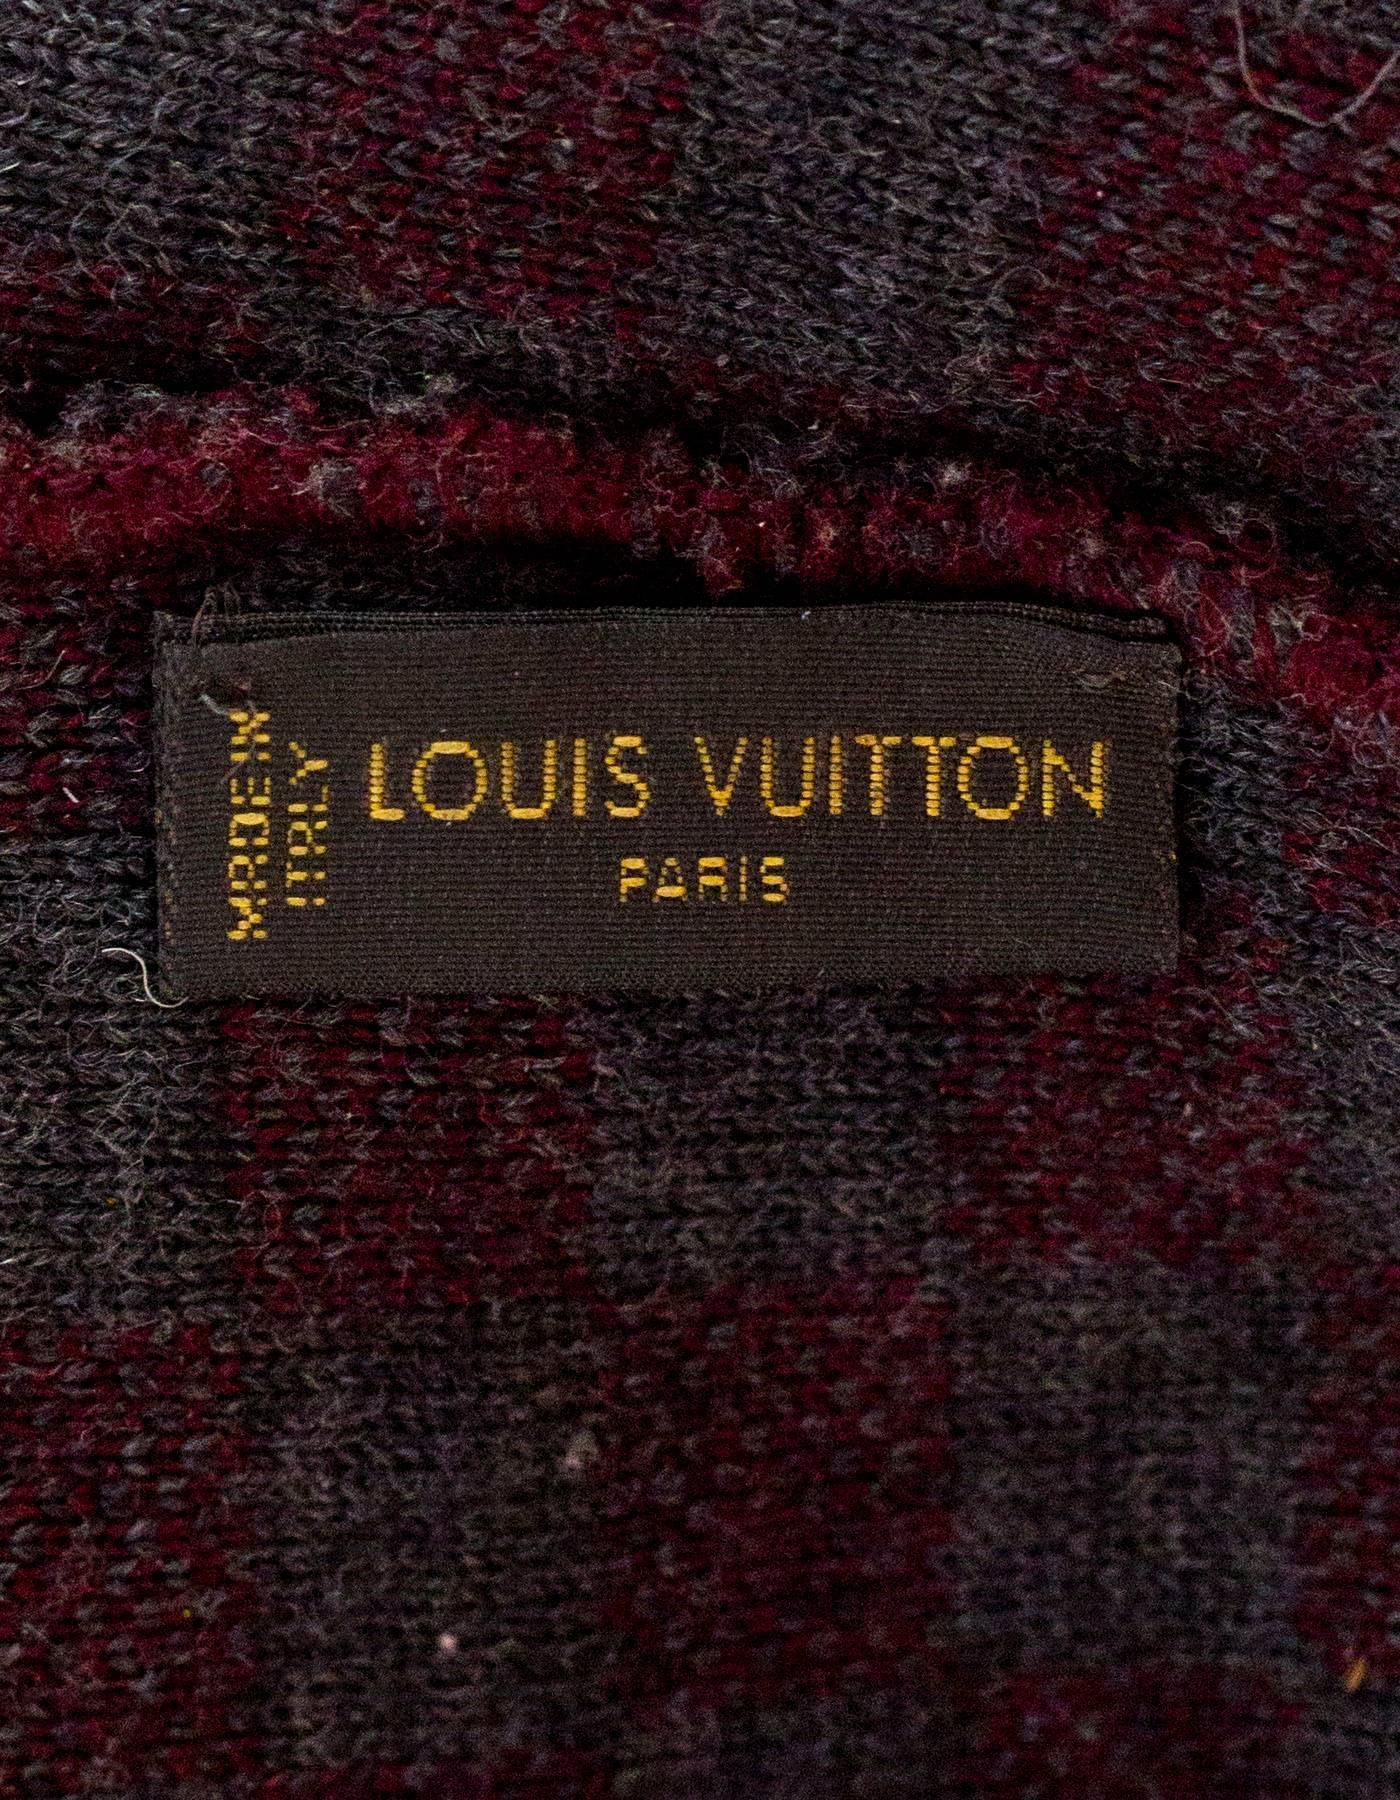 Louis Vuitton Burgundy and Grey Wool Bonnet Petit Damier Beanie Hat For  Sale at 1stdibs 45c2d2c1ef3